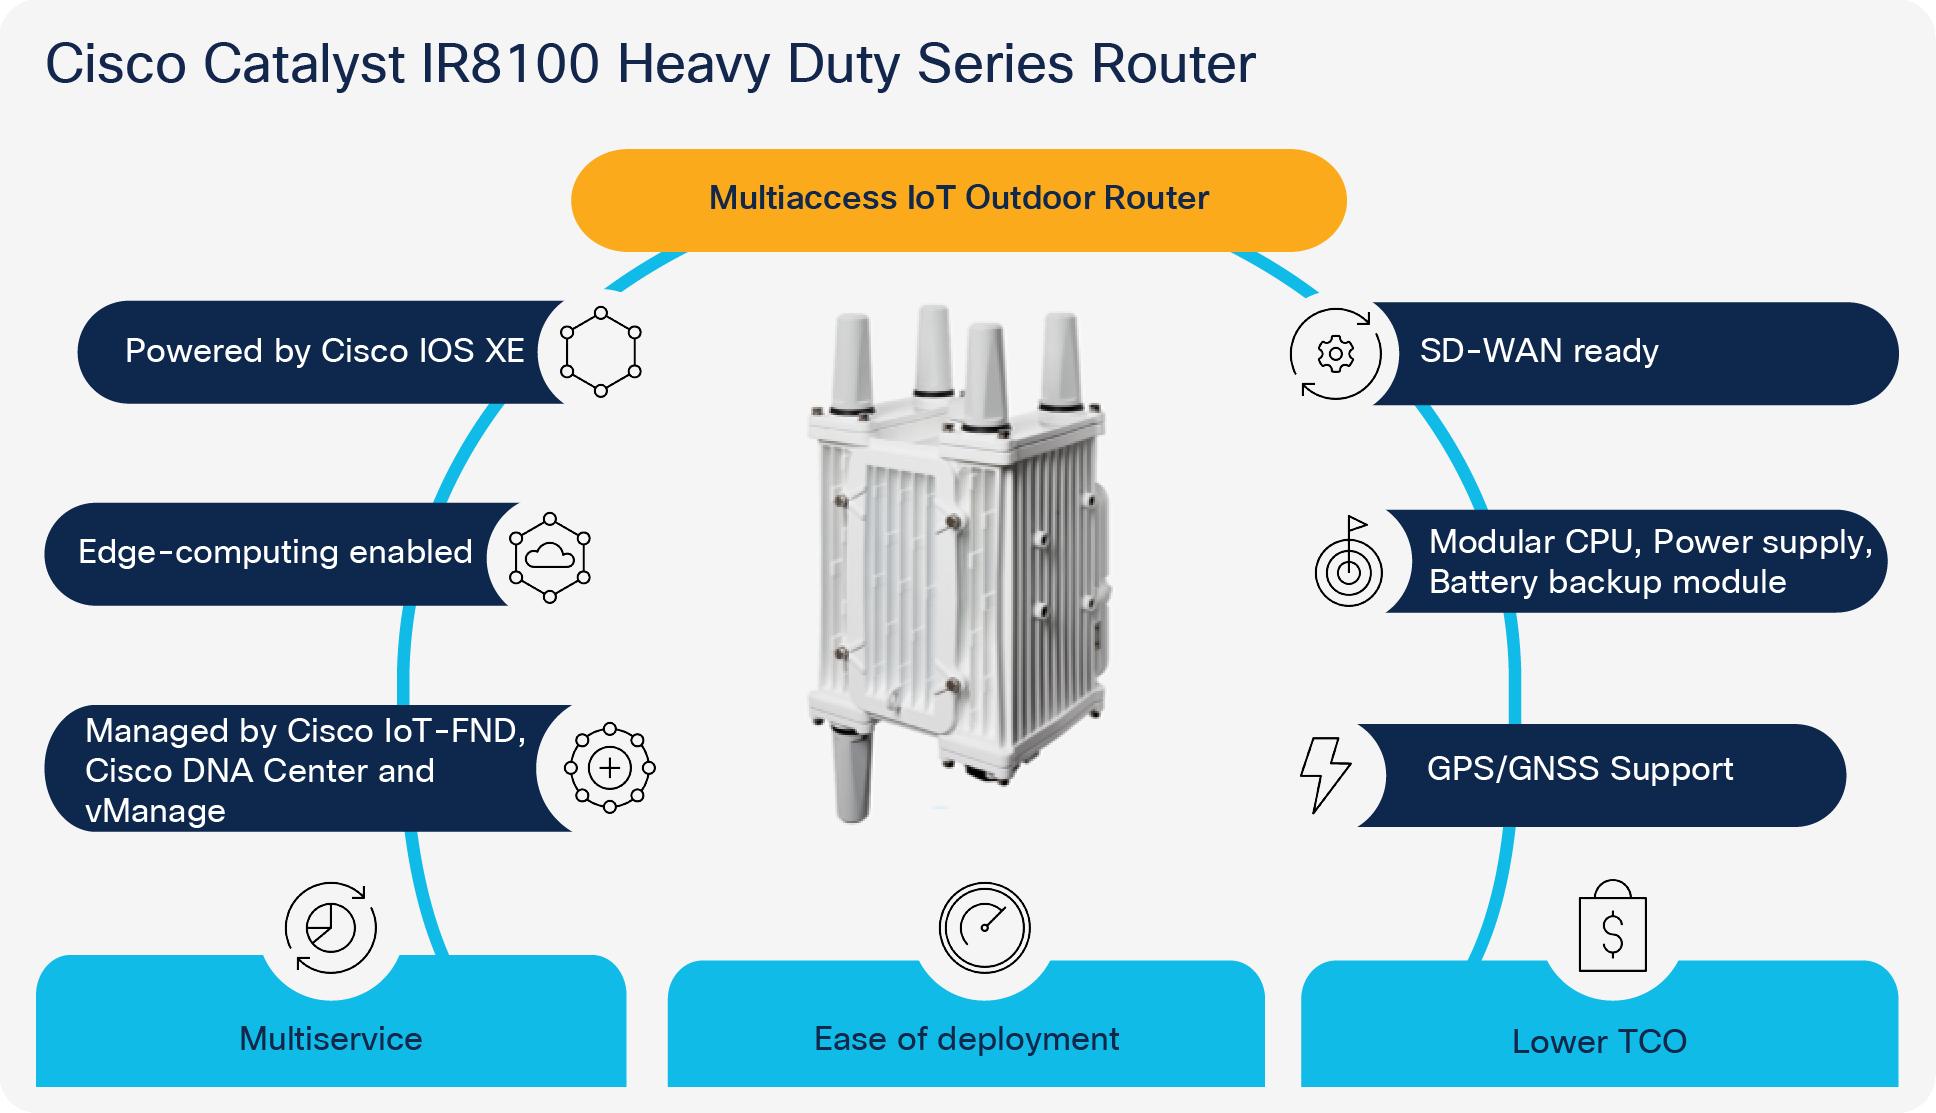 Cisco Catalyst IR8100 Heavy Duty Series Router Data Sheet - Cisco